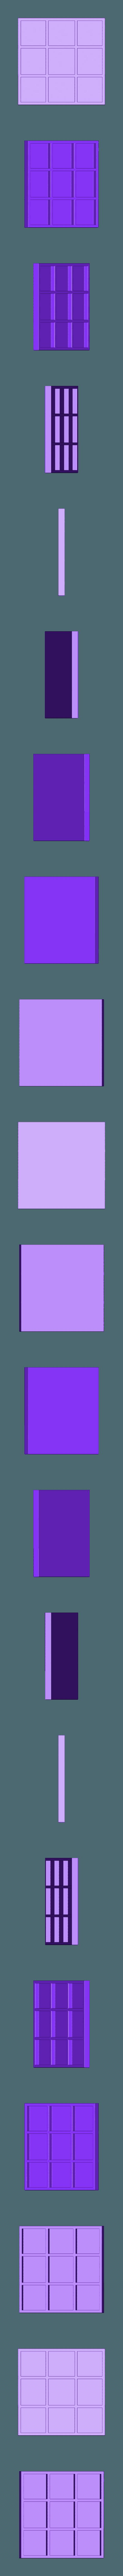 Tic-Tac-Toe Board.stl Download free STL file Tic-Tac-Toe • Template to 3D print, FerryTeacher